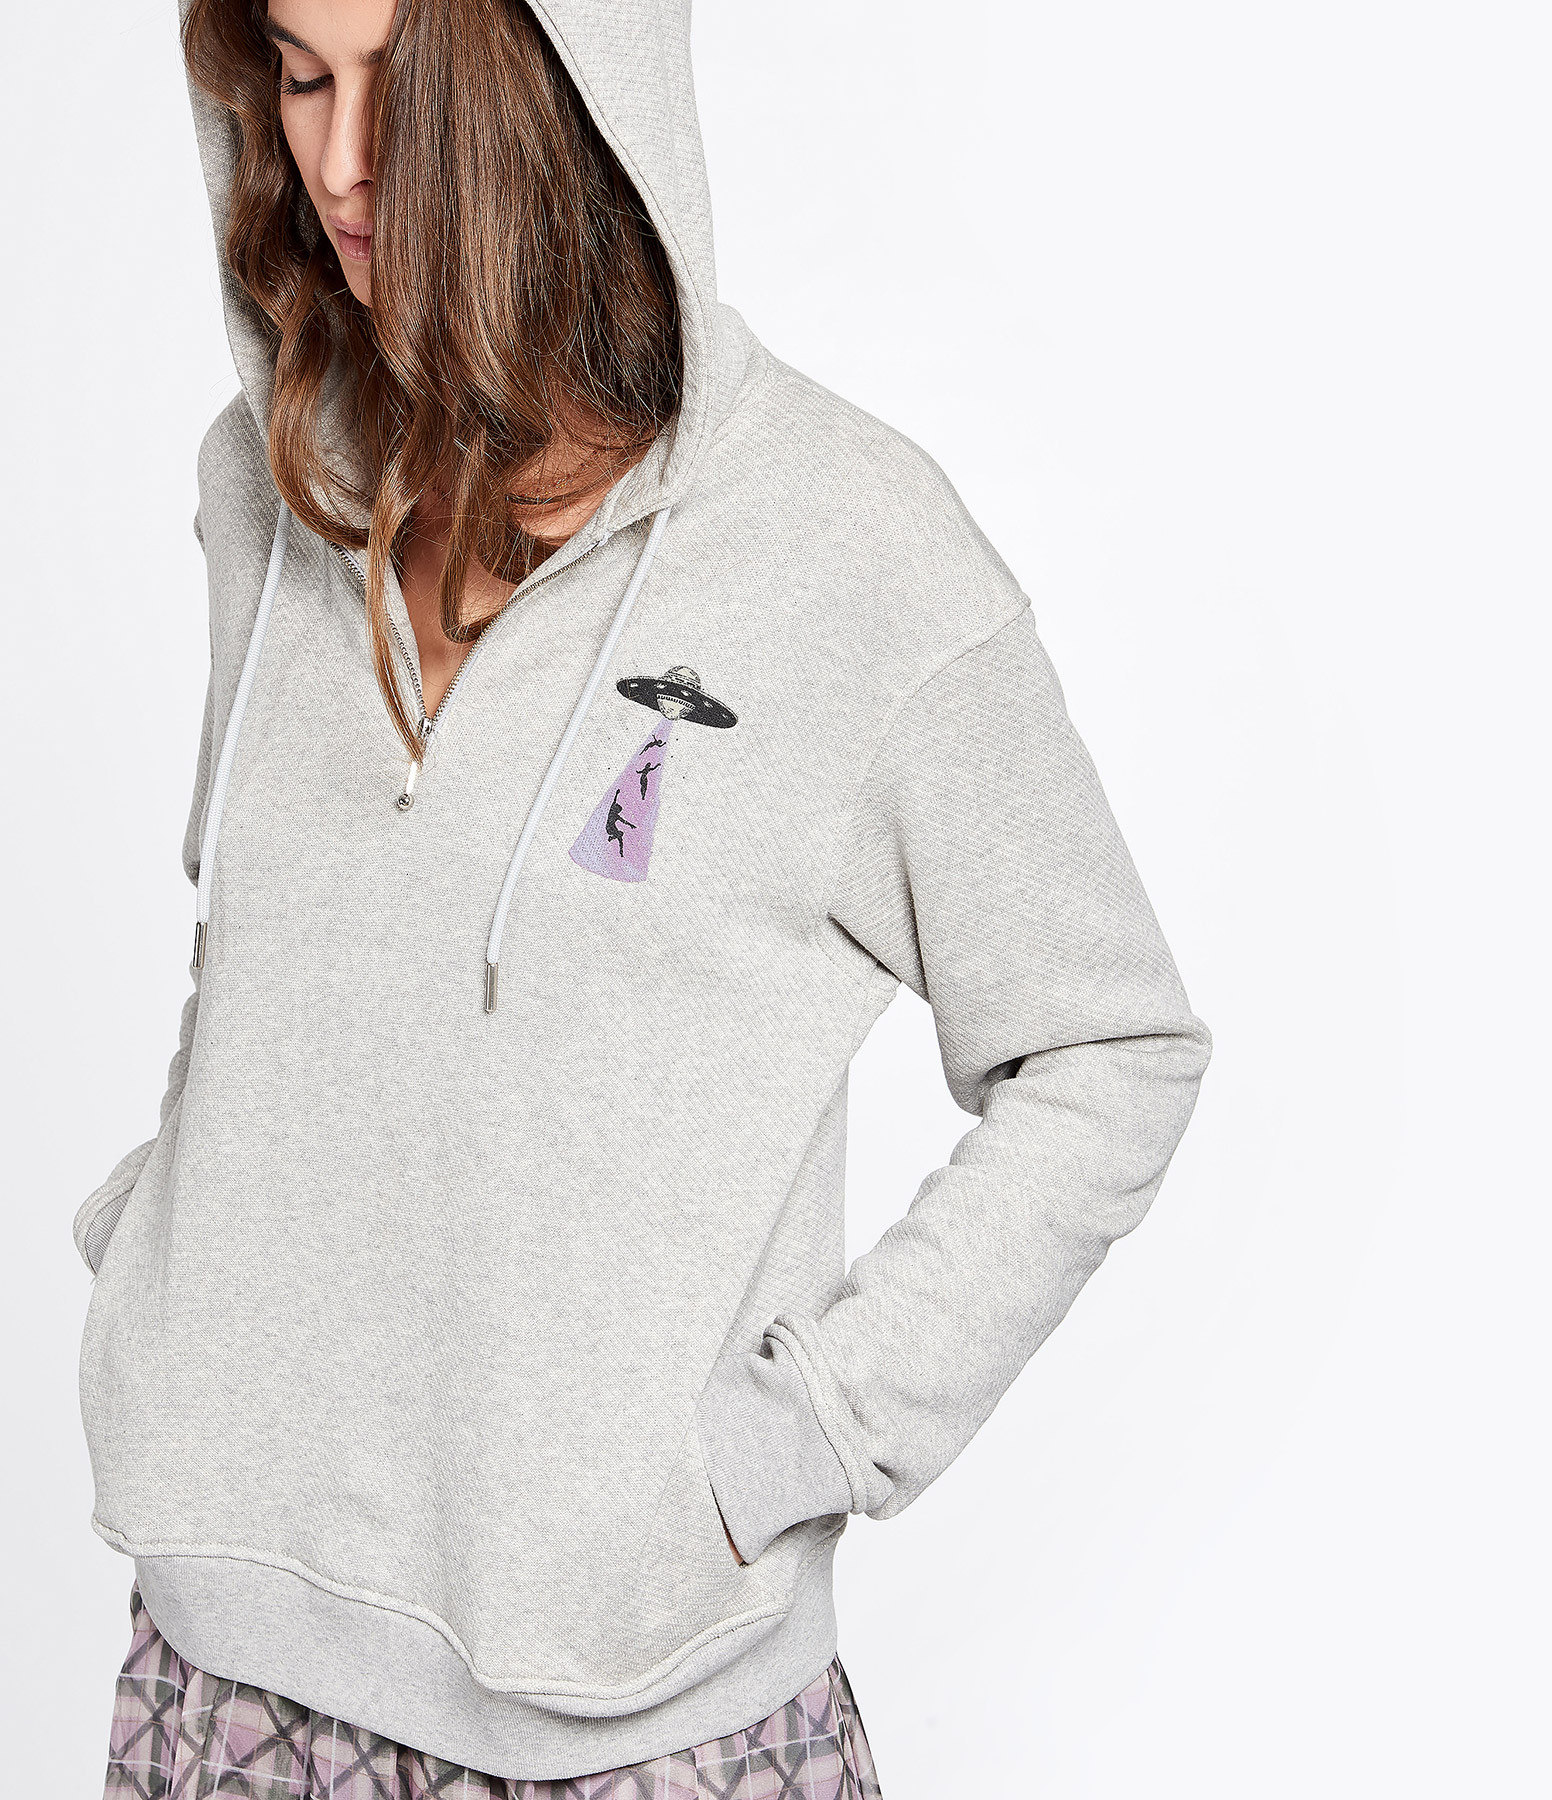 ALEXA CHUNG - Sweatshirt OVNI Coton Gris